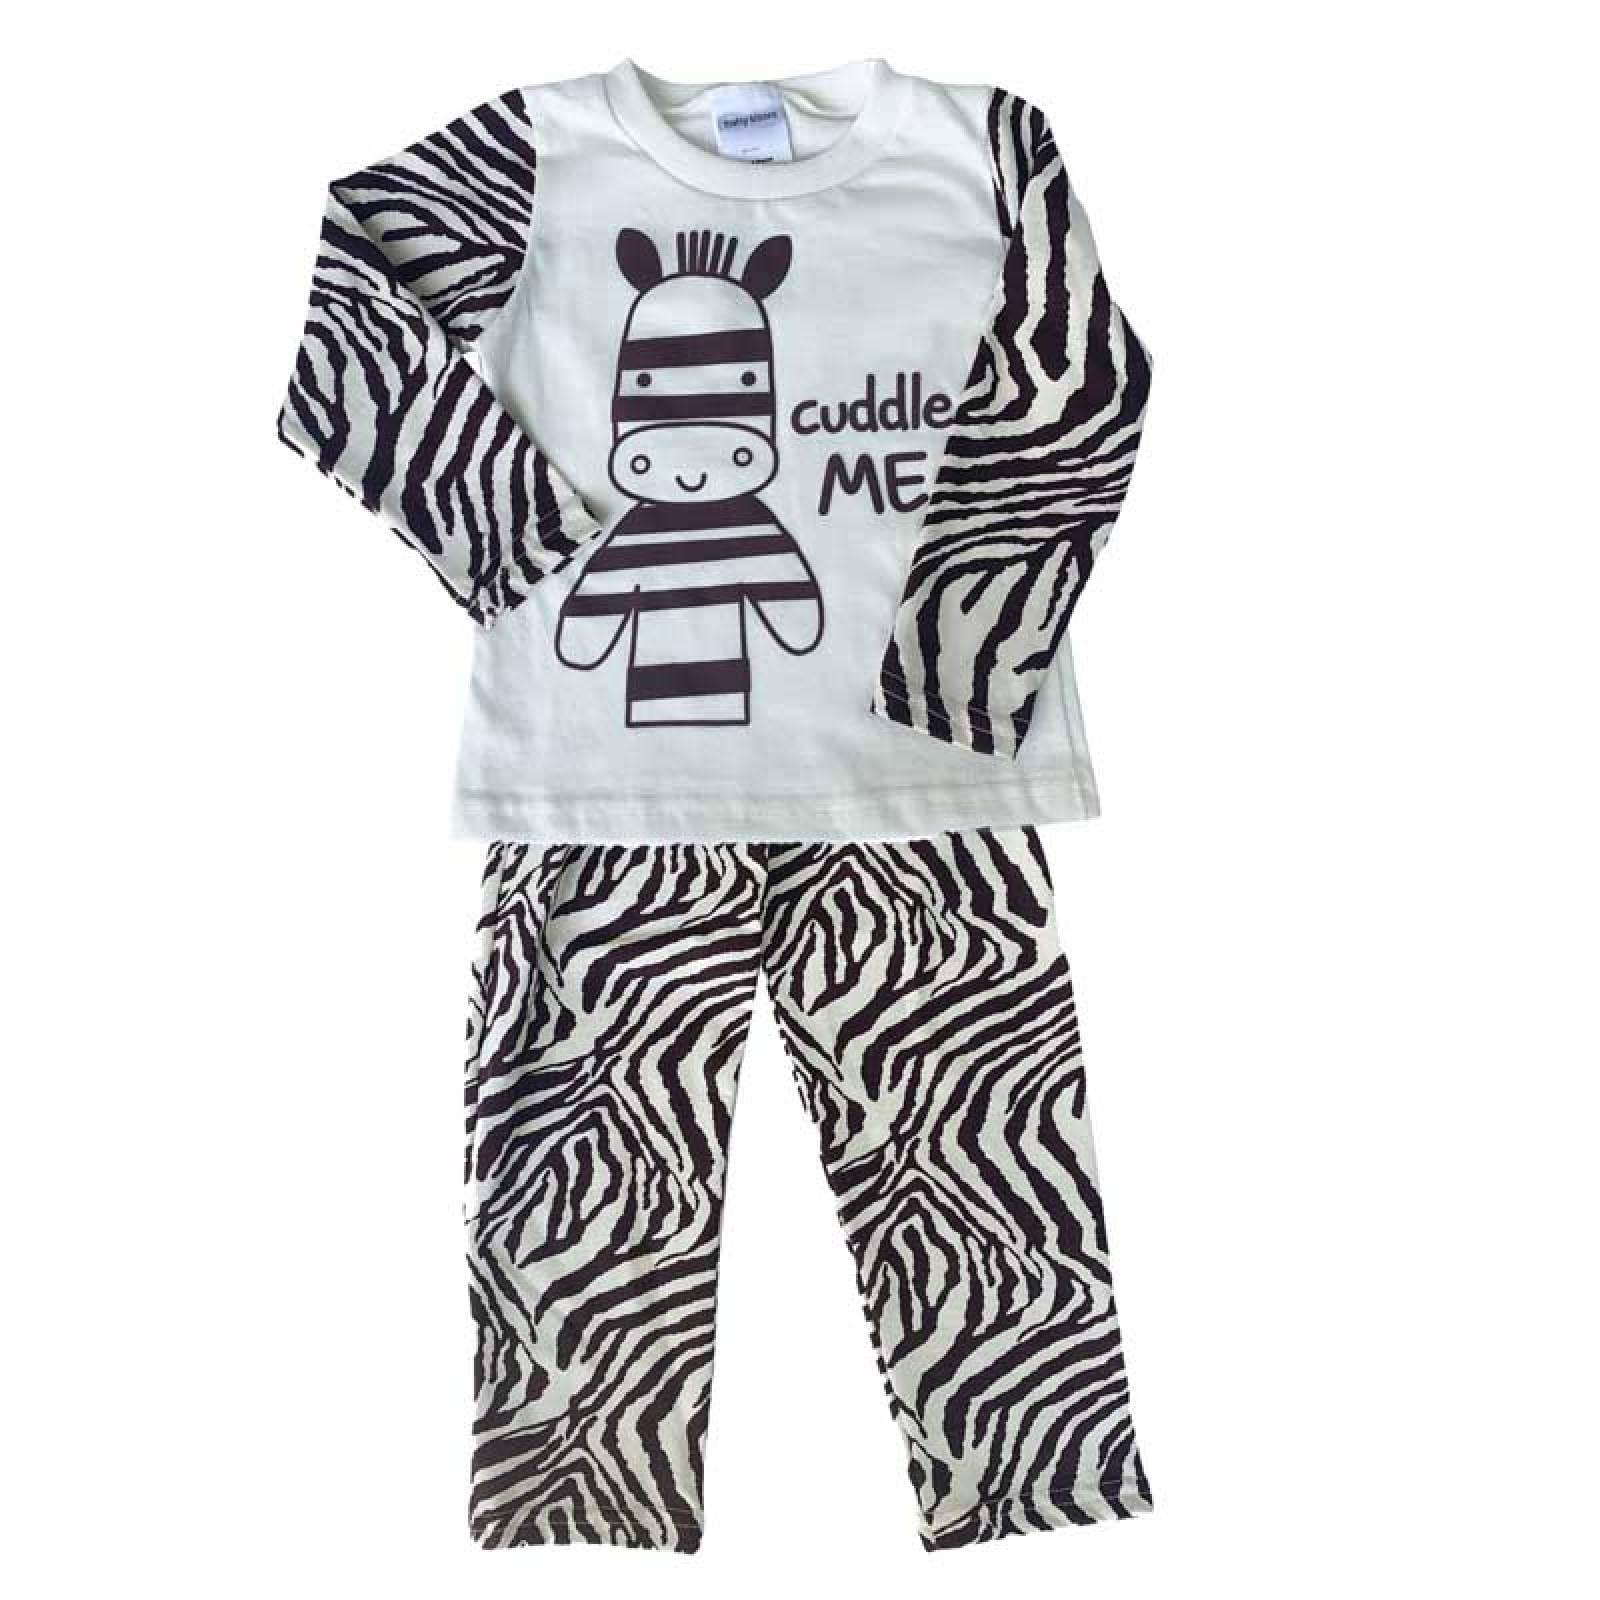 Paquete 2 Pijamas Algodon Con Pantalon Estampados Cebra Catarina